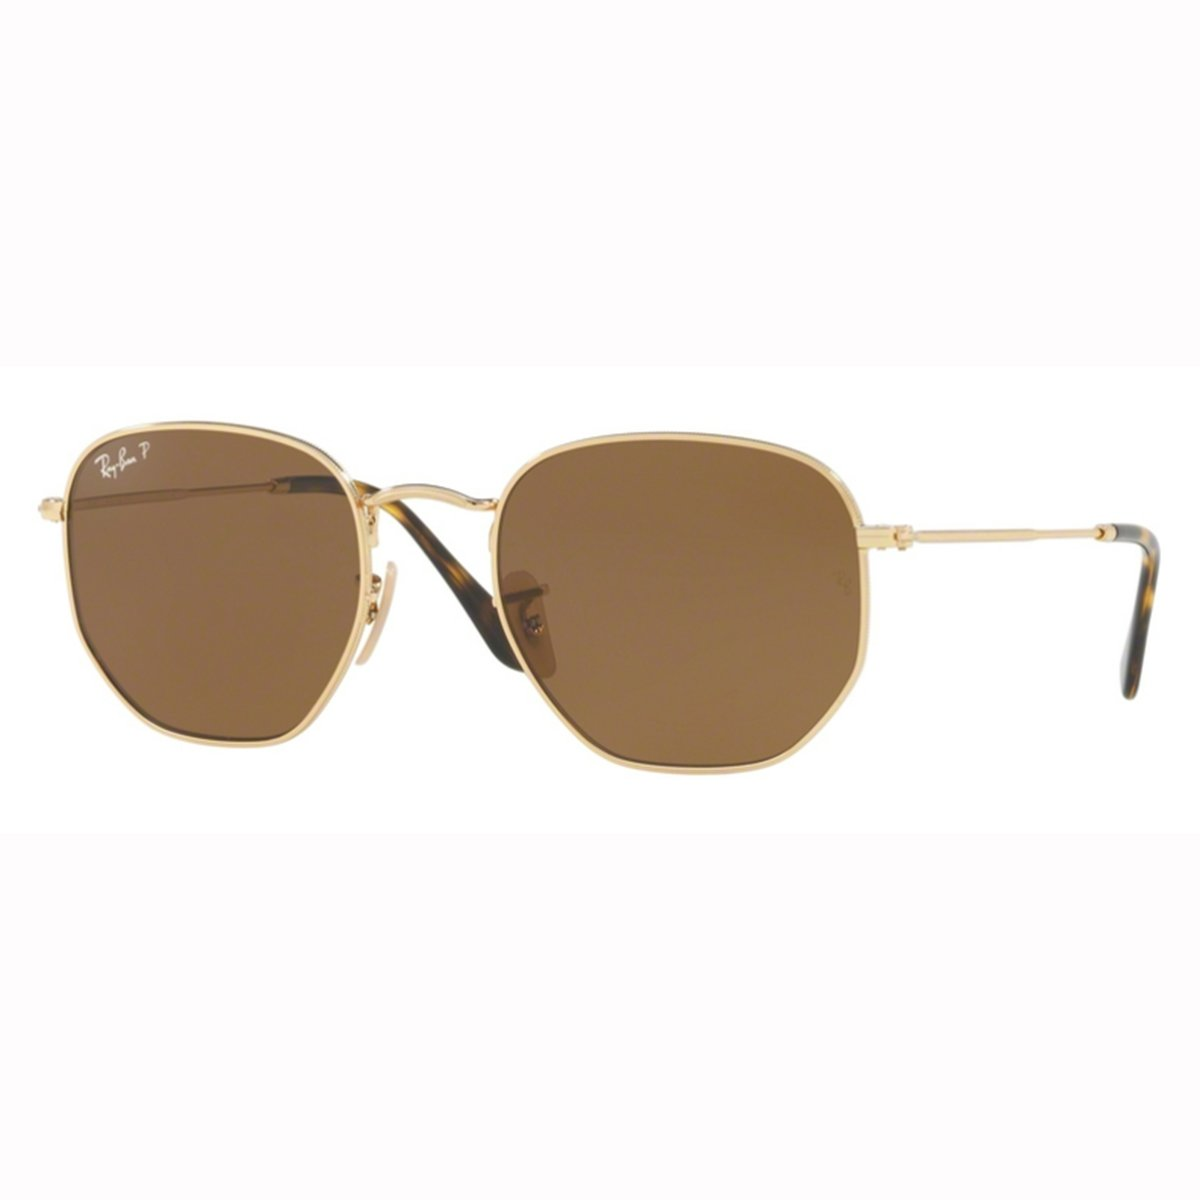 274654137e4b0 Compre Óculos de Sol Ray Ban Hexagonal OverSized em 10X